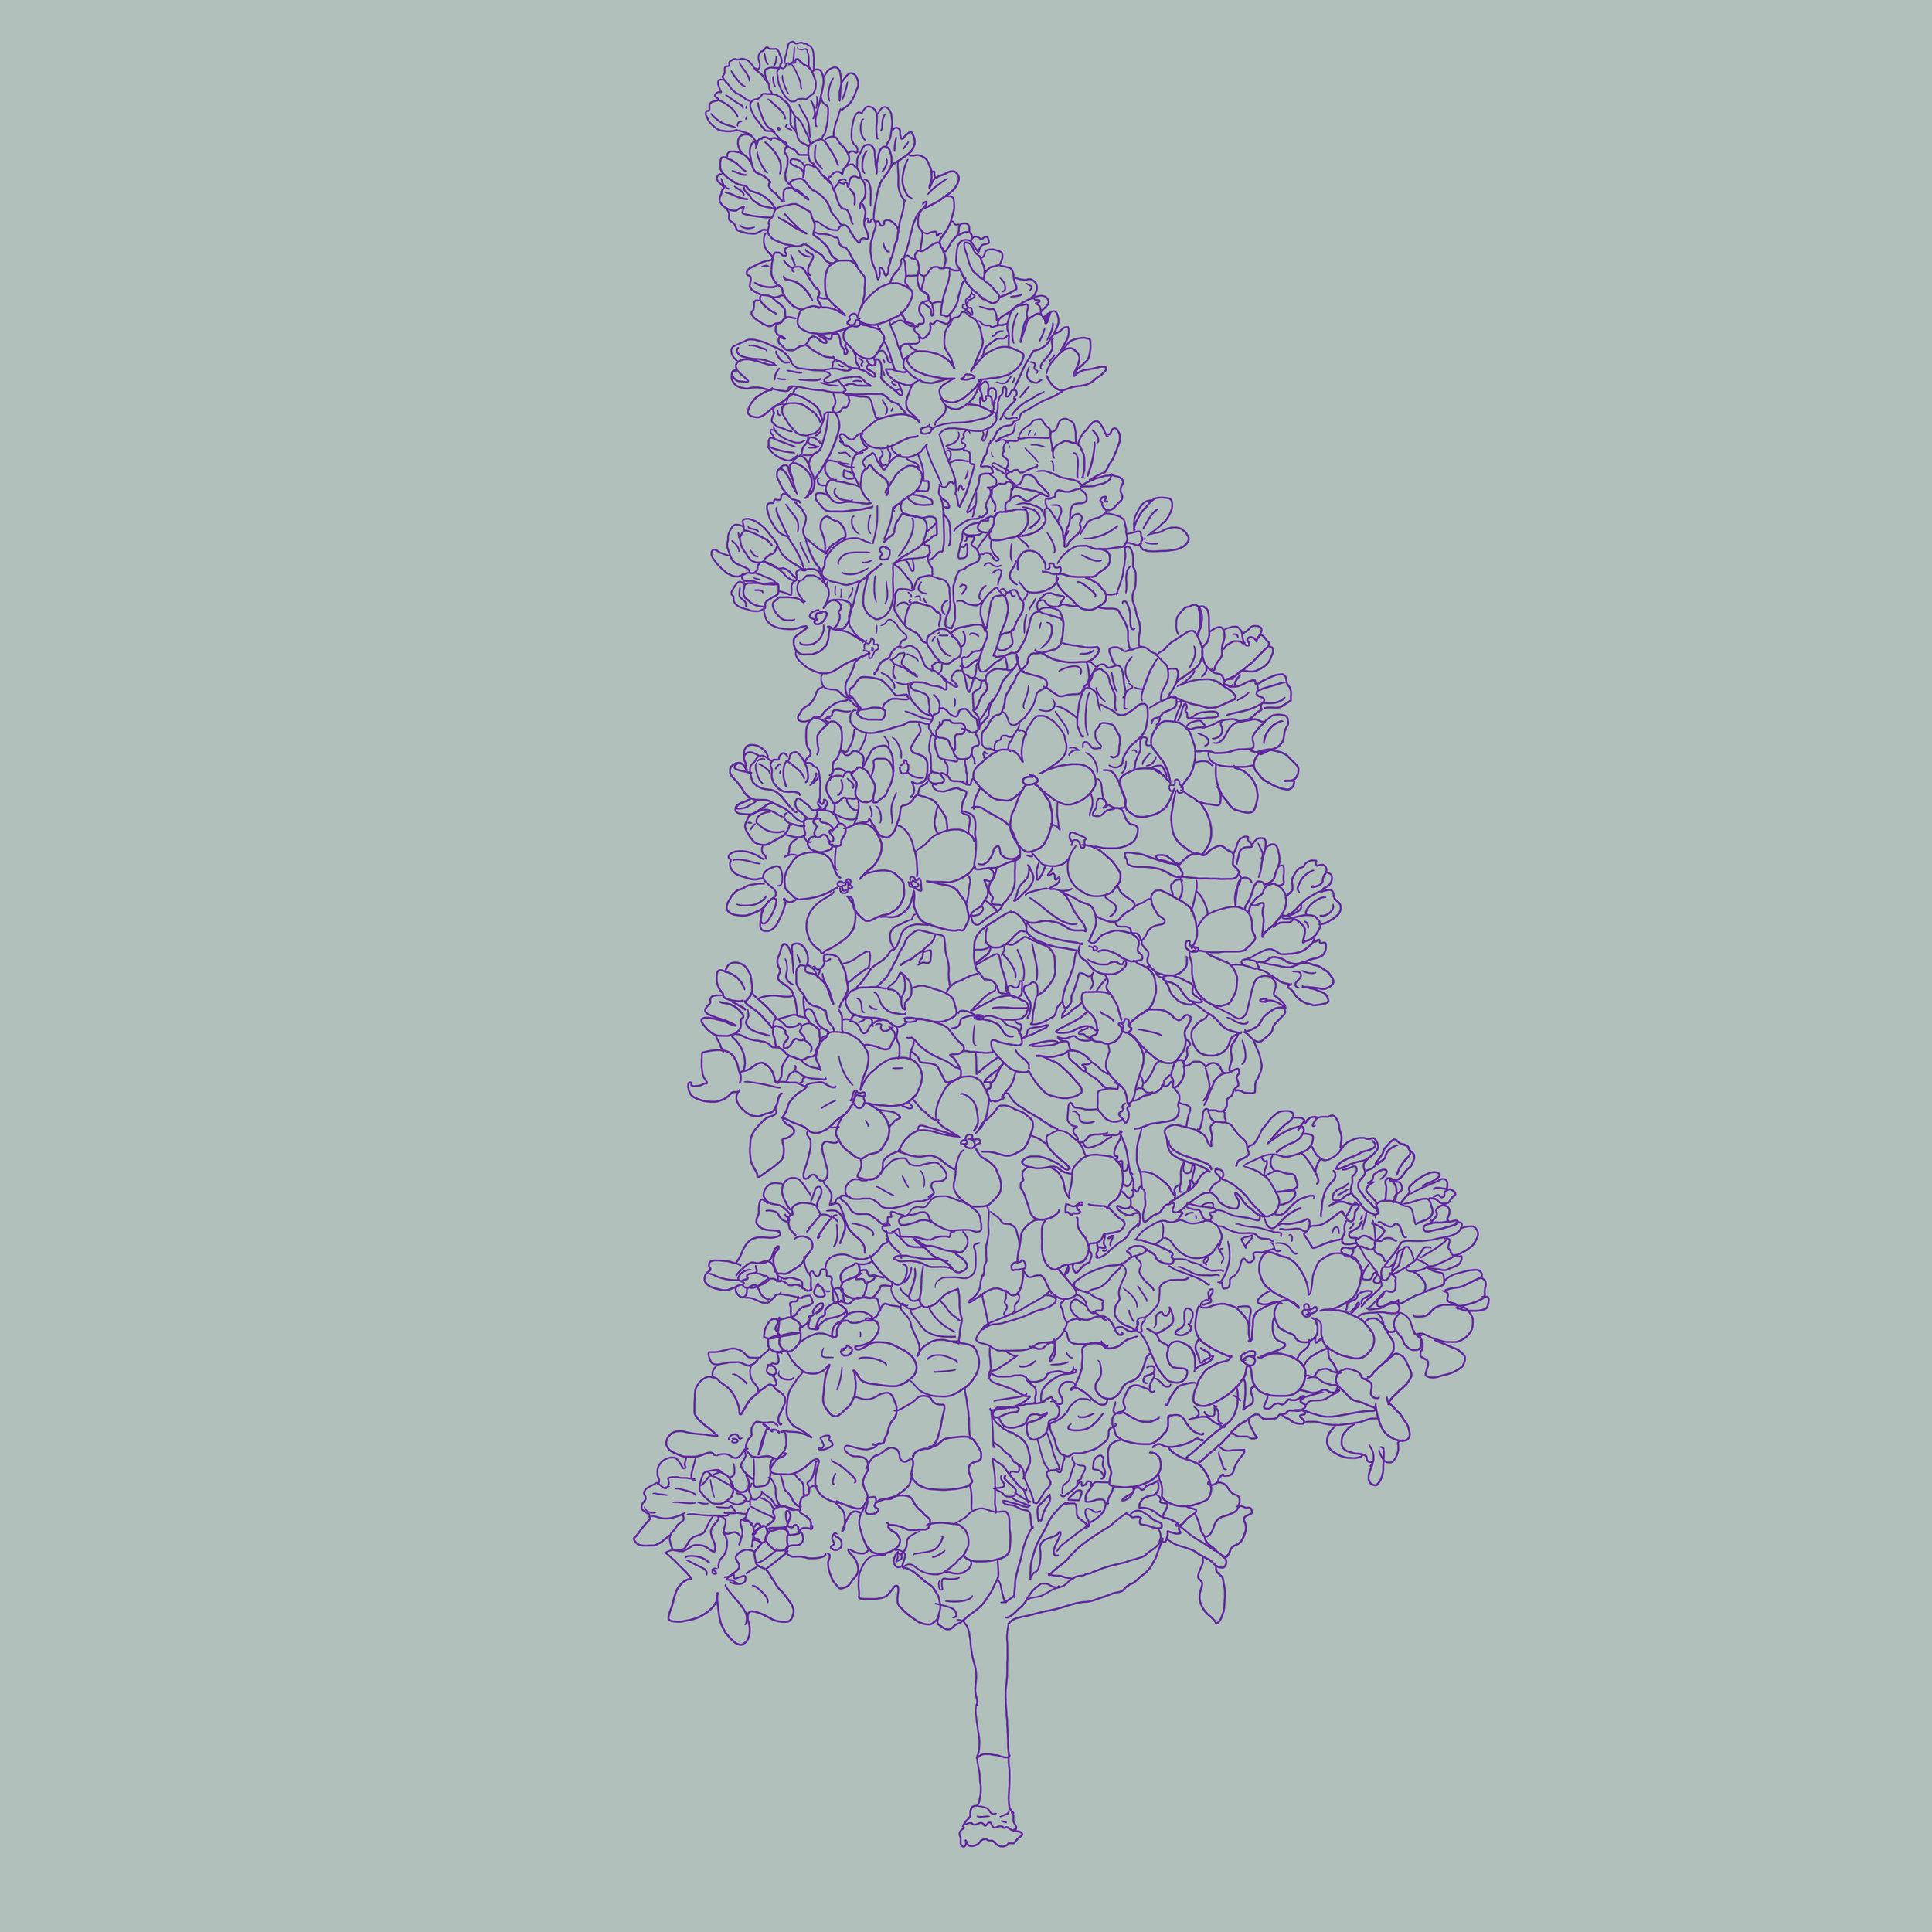 28_Flowers-B.jpg